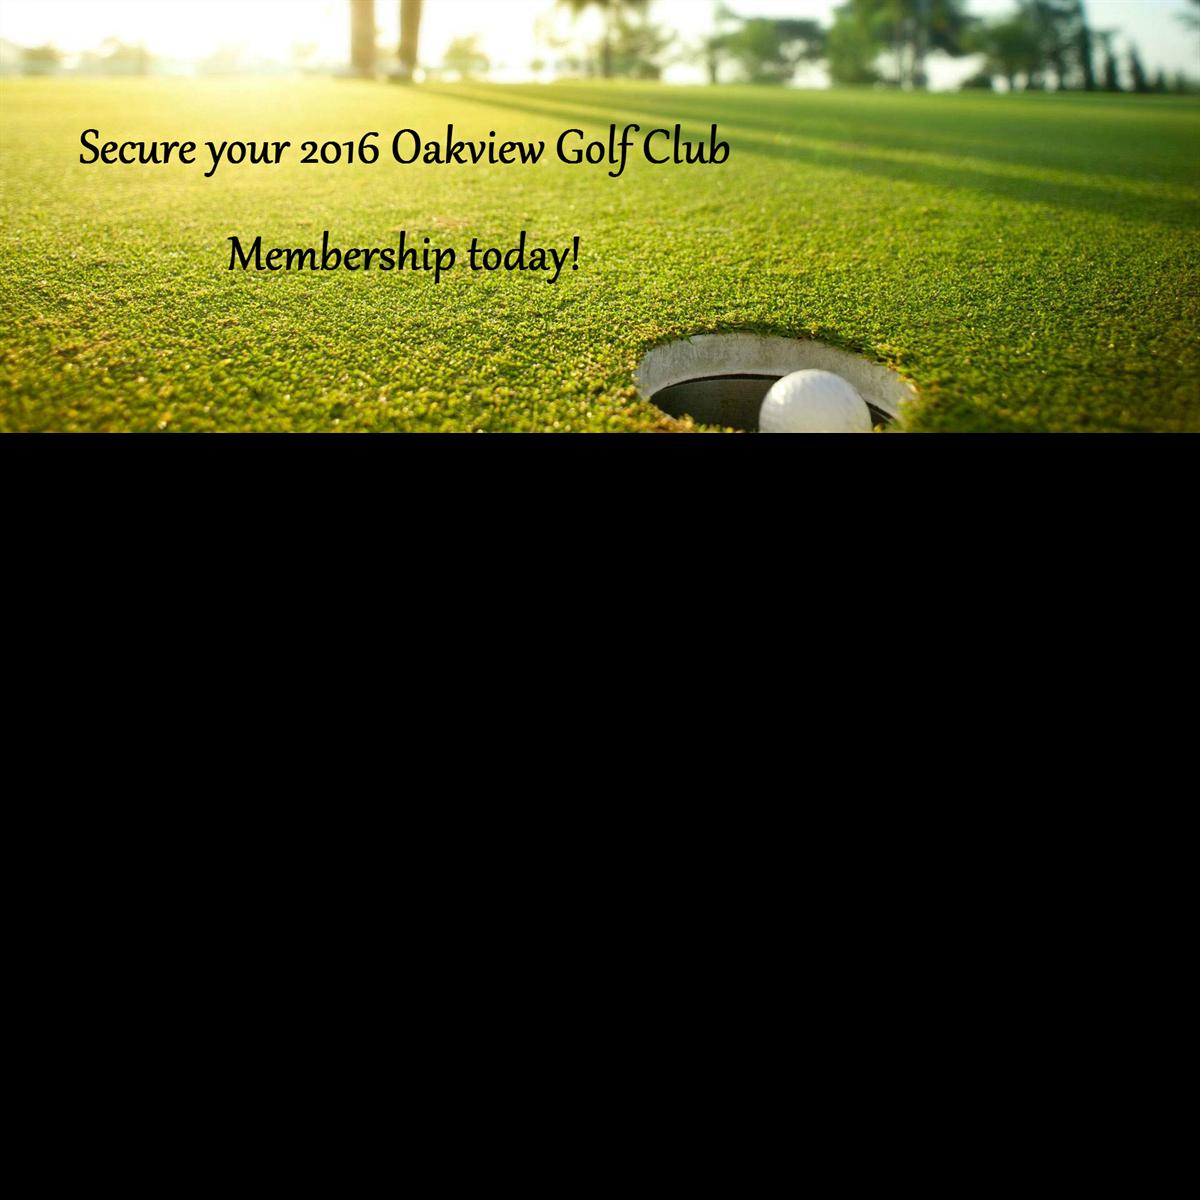 2016 memberships golfing Oakview Golf Club Pittsburgh membership Slippery Rock PA